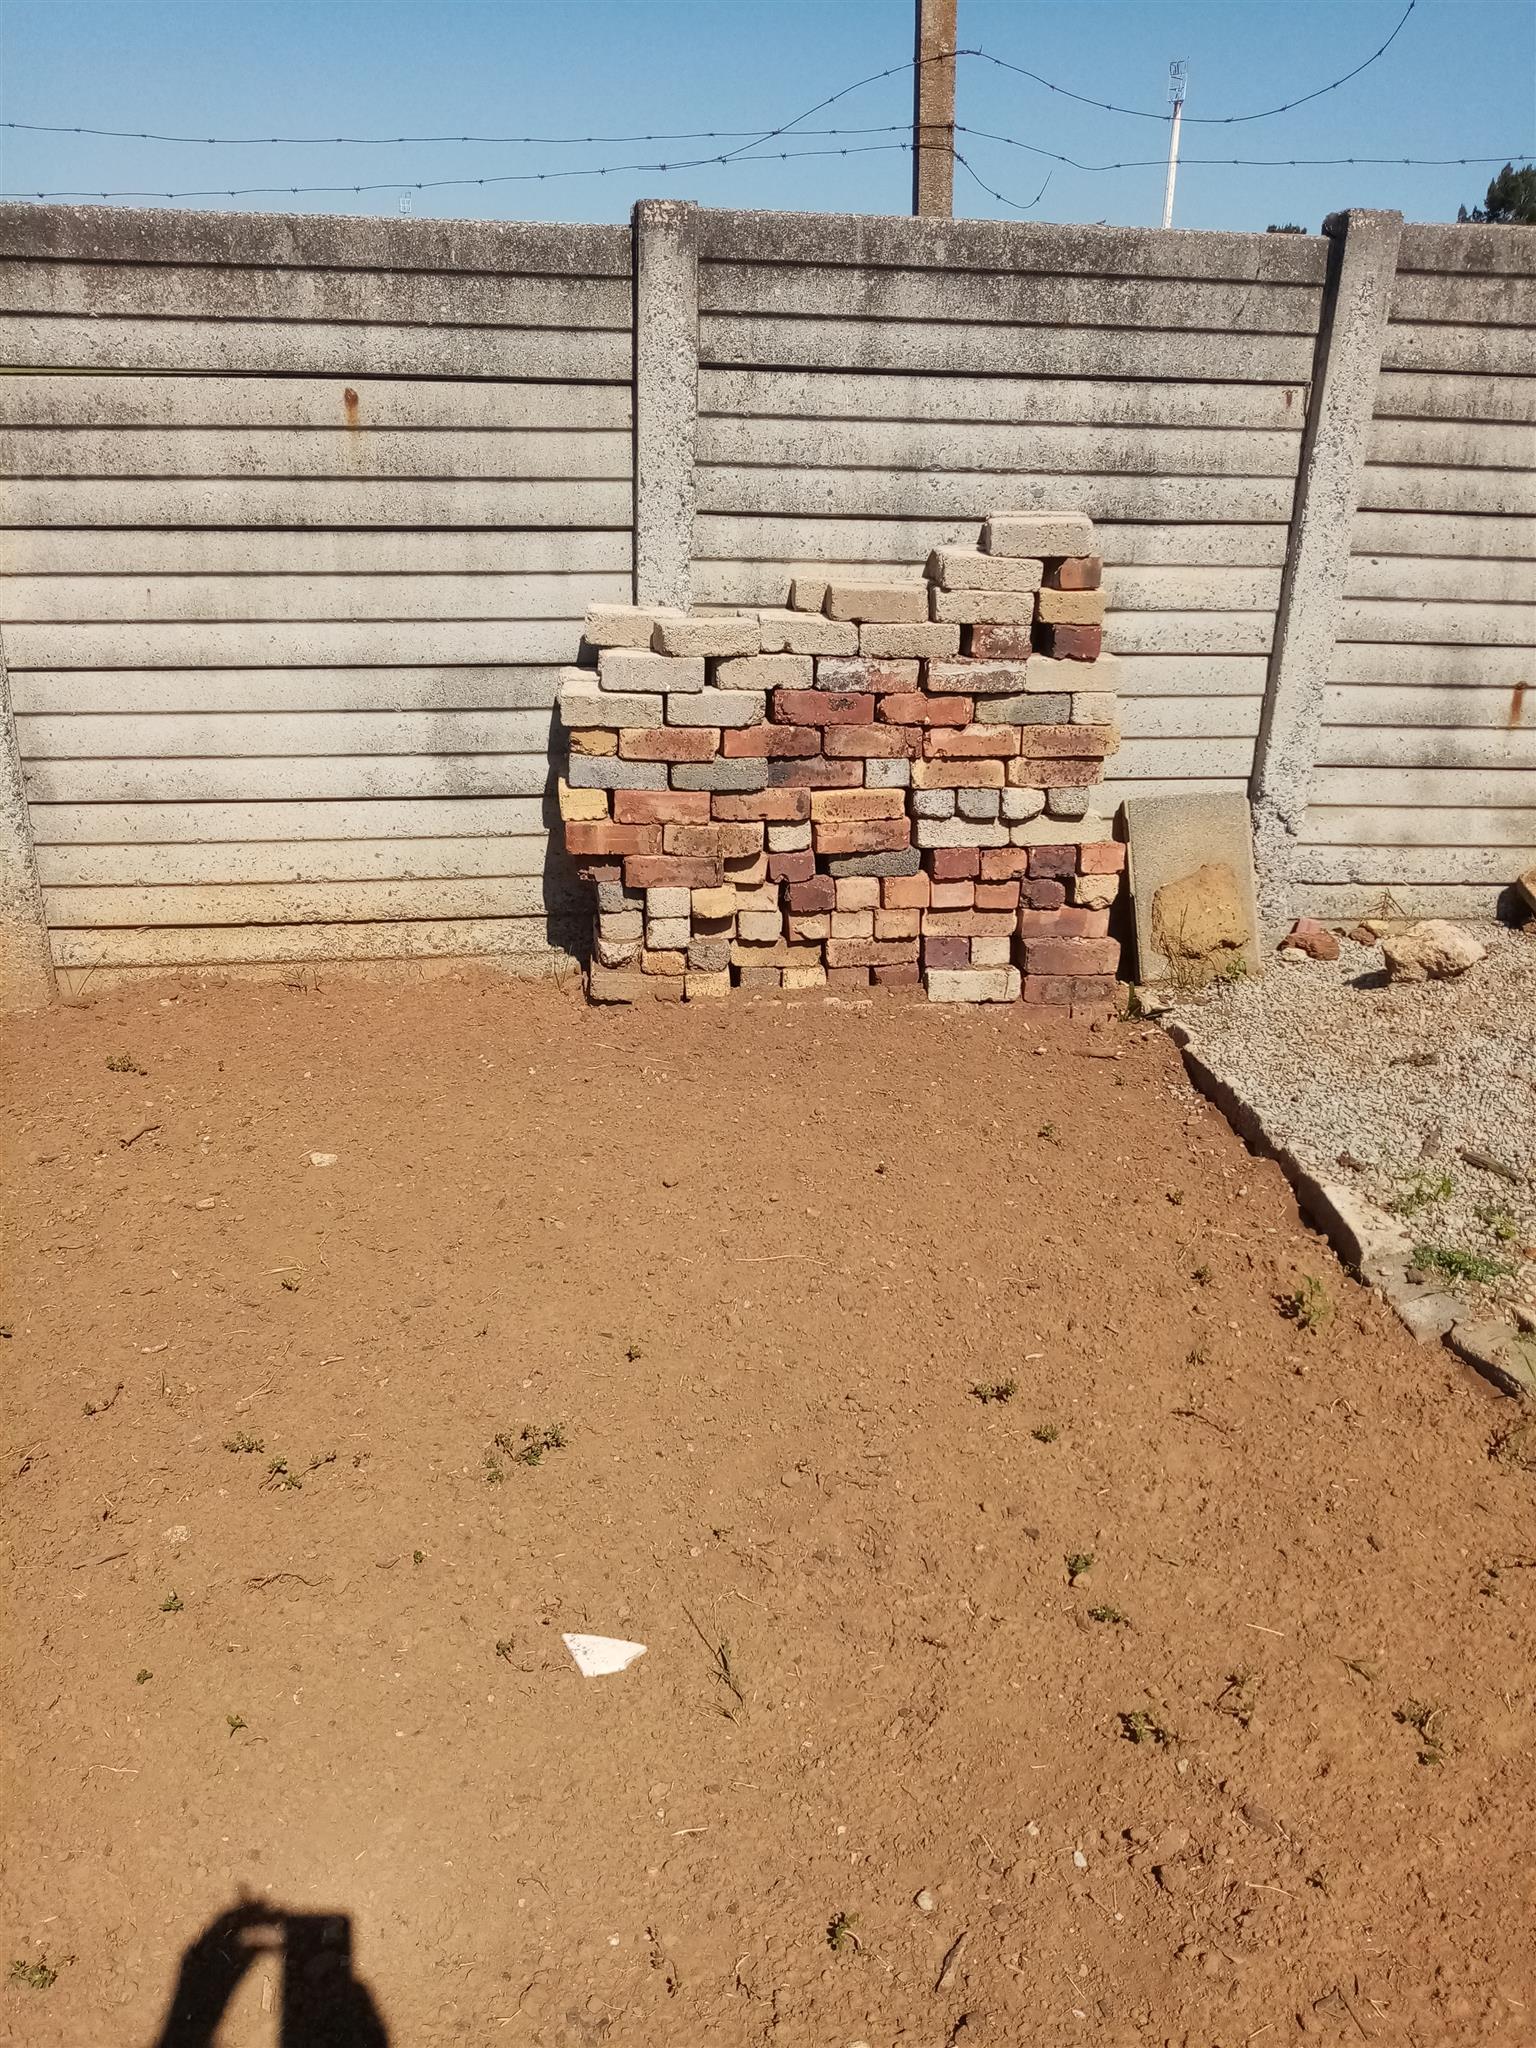 Bricks whole and half